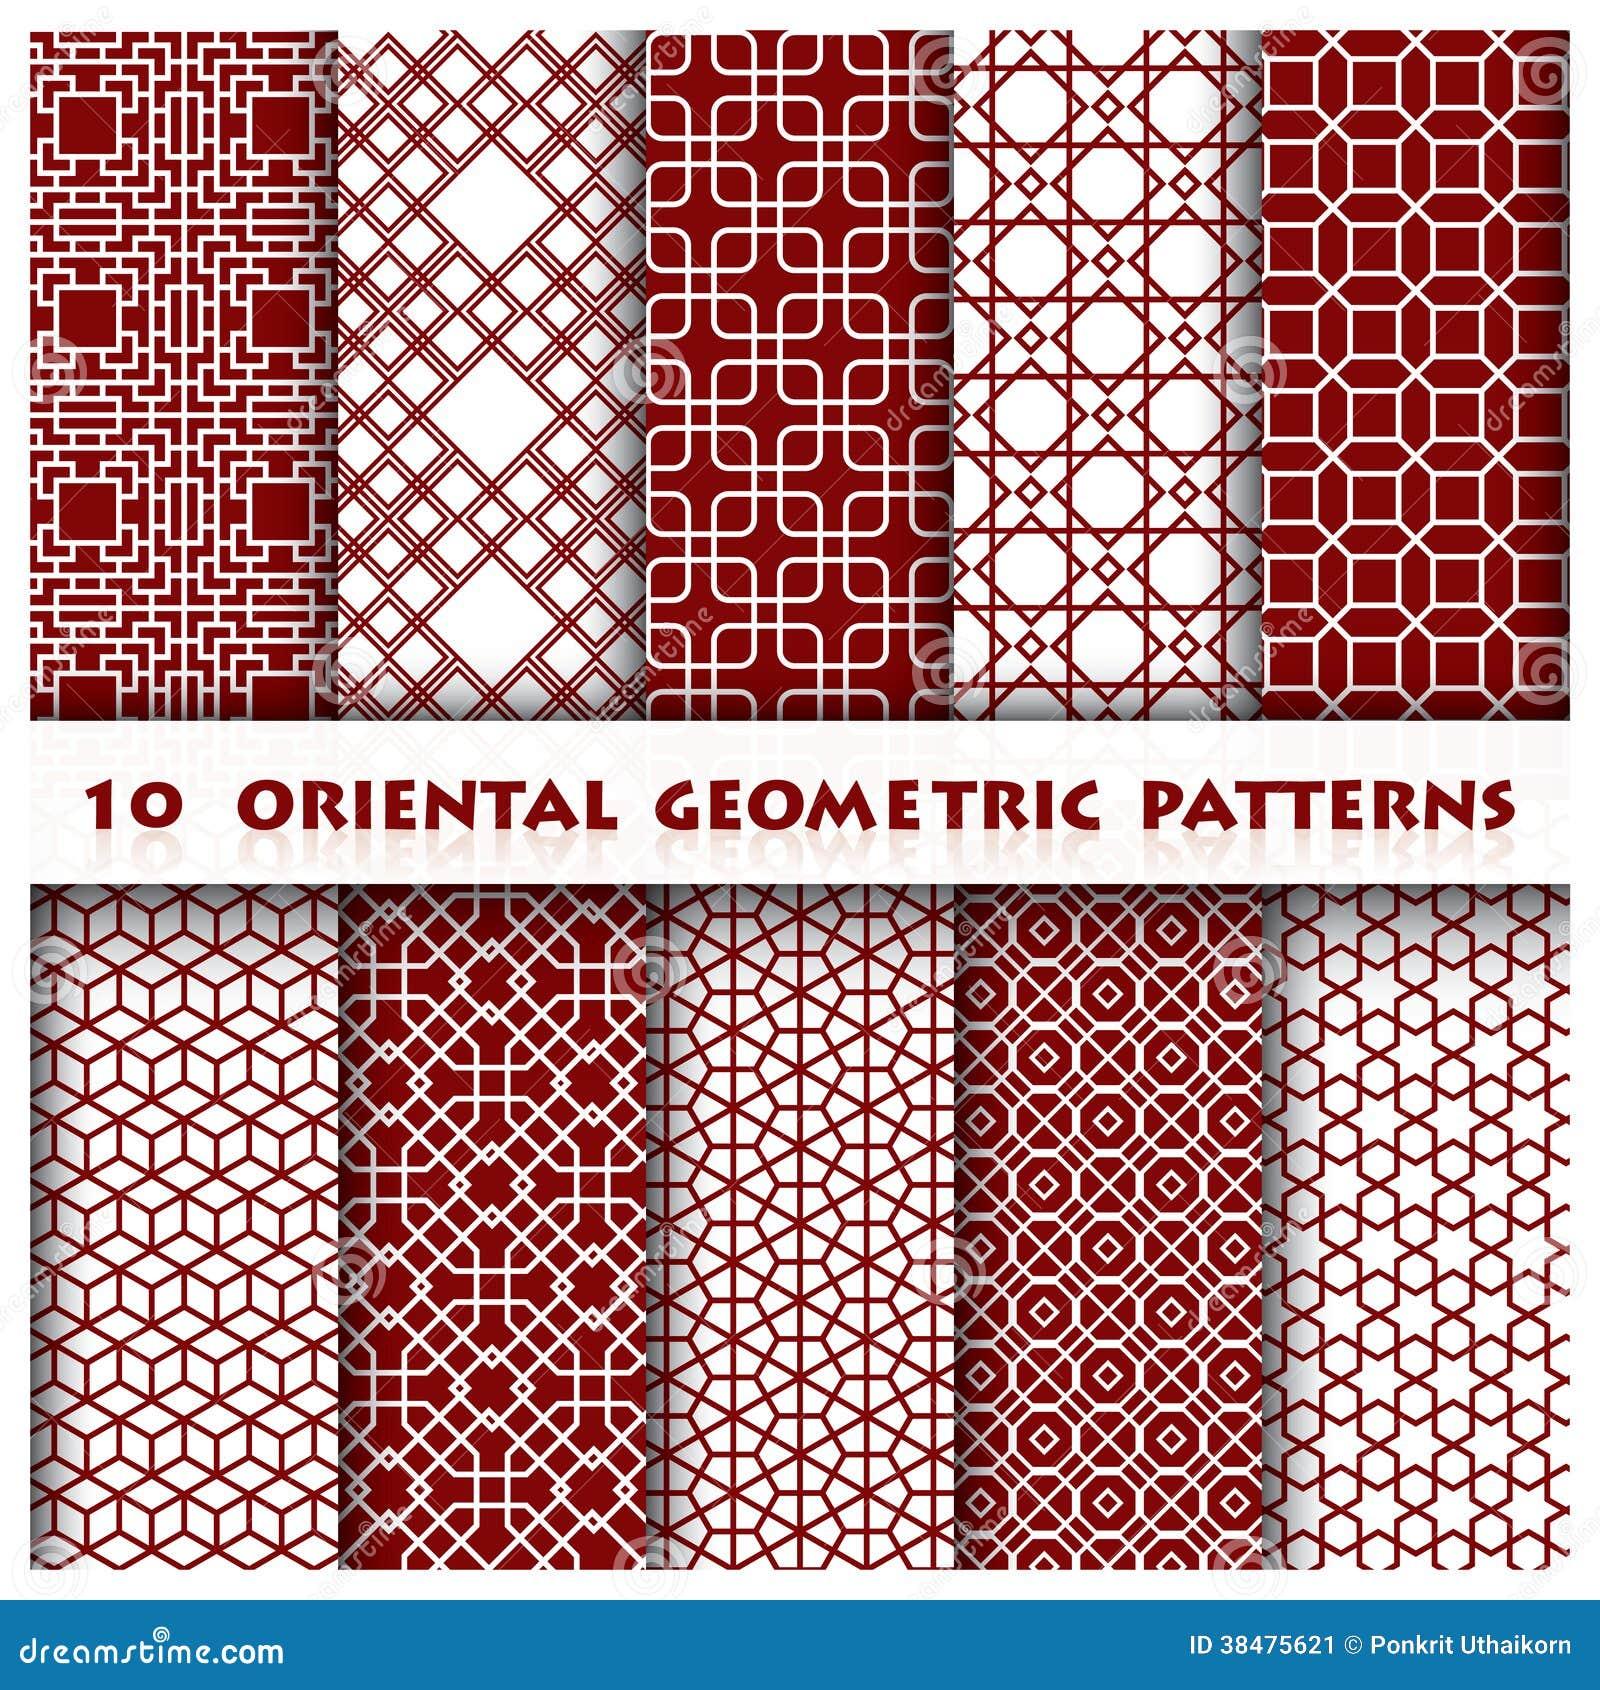 orientalische geometrische muster art stockbild bild 38475621. Black Bedroom Furniture Sets. Home Design Ideas